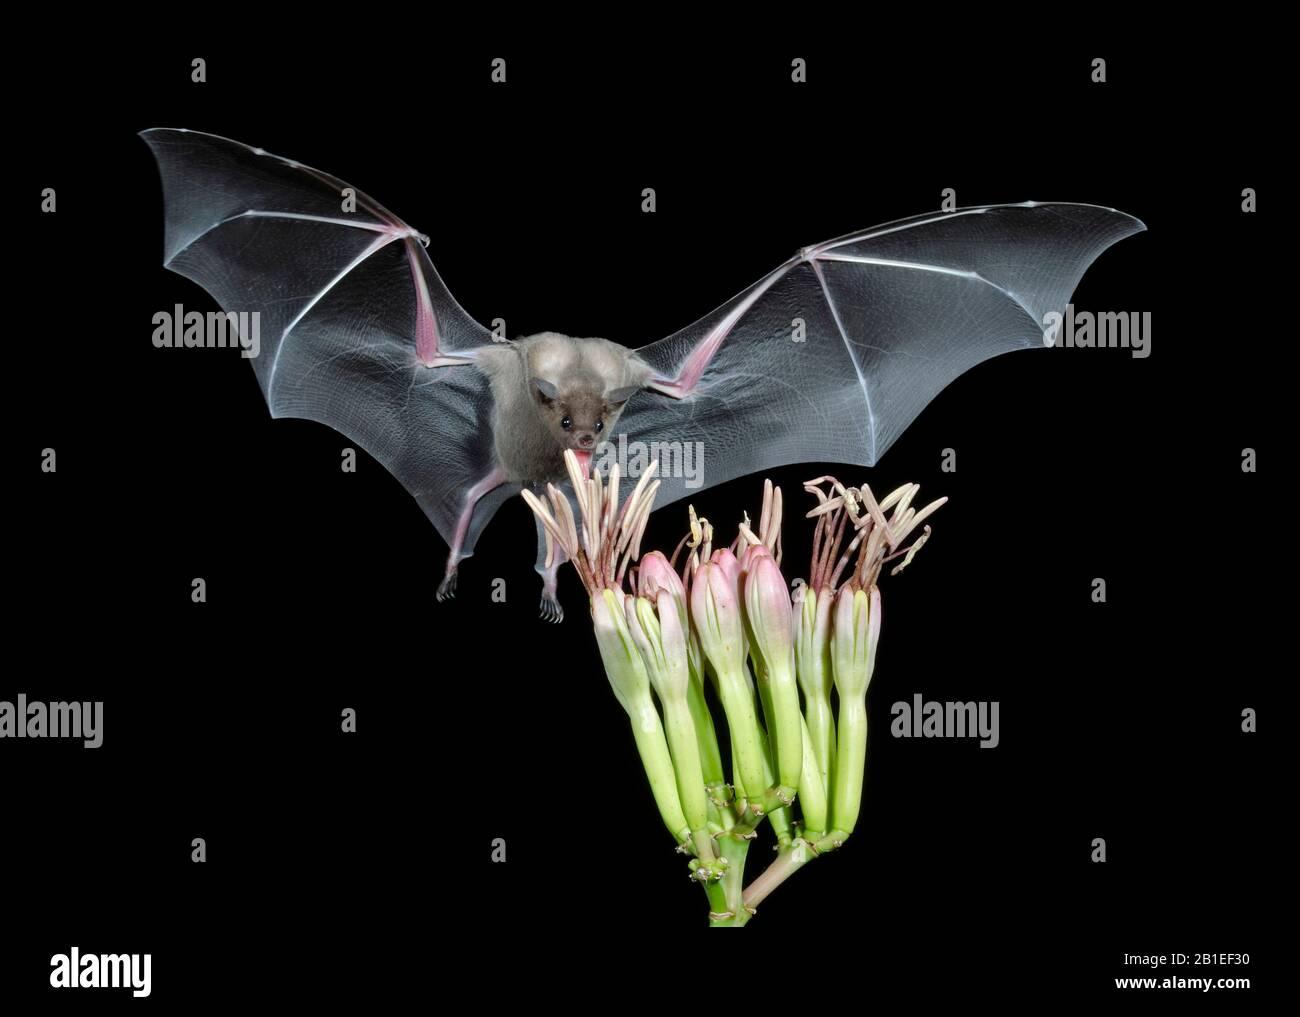 Lesser long-nosed bat (Leptonycteris curasoae), feeding on an Agave Flower. Amado, Arizona. Stock Photo